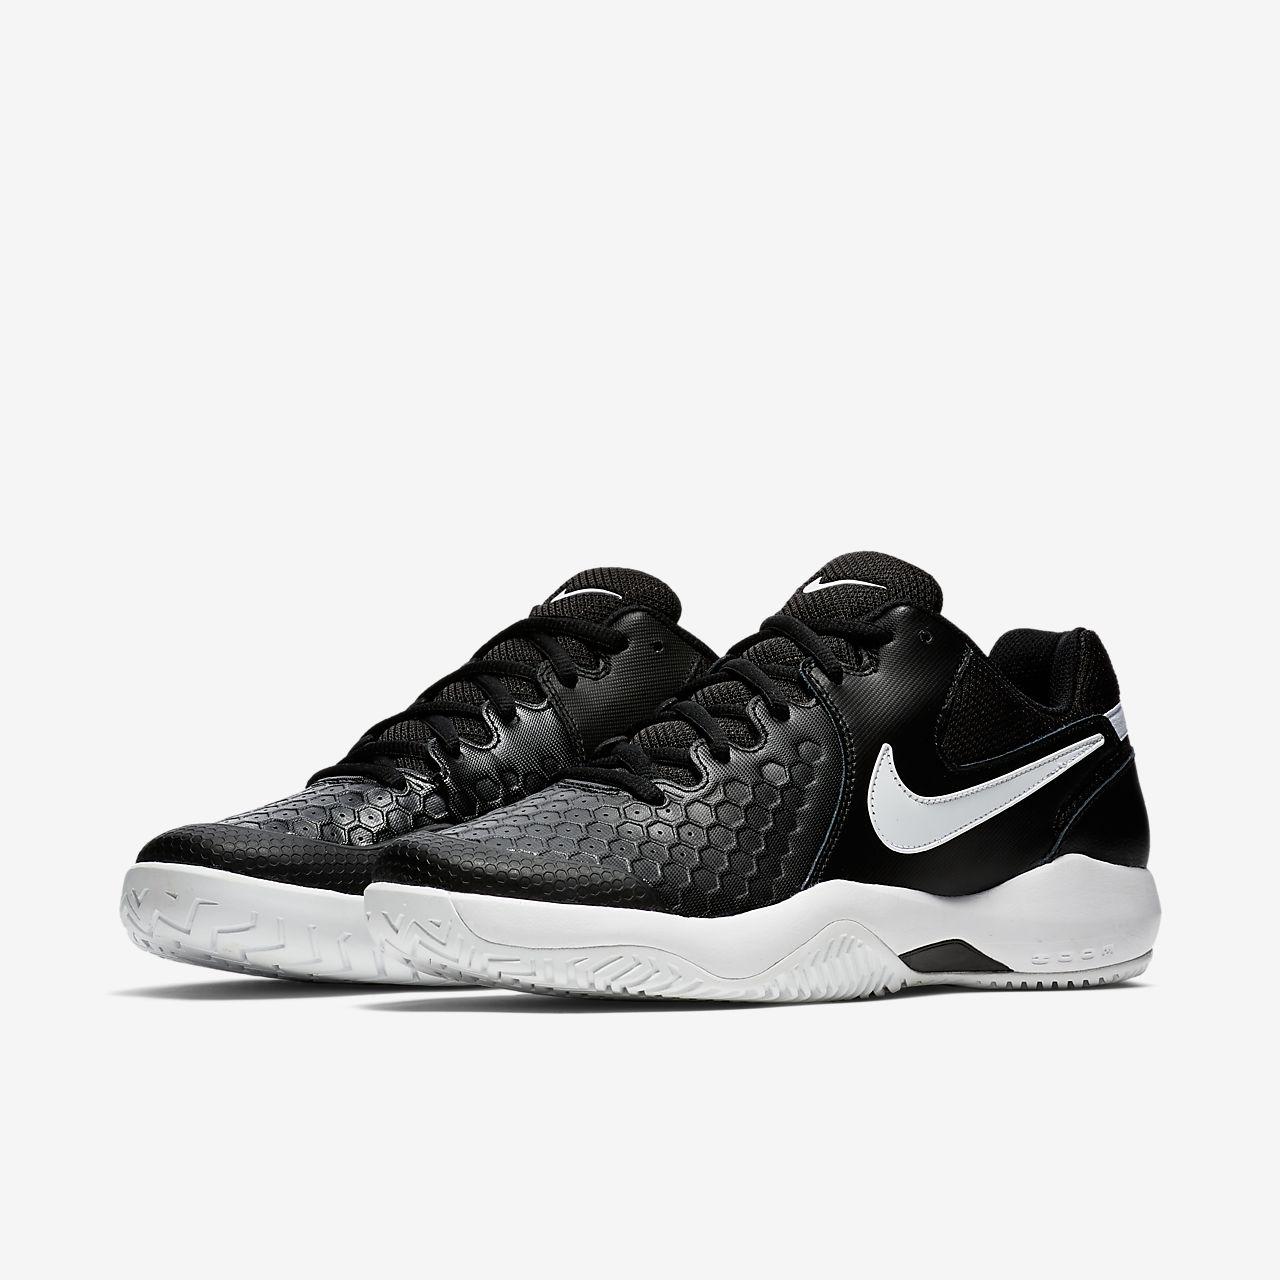 new product 4842b 6eb54 ... Tennissko NikeCourt Air Zoom Resistance Hard Court för män